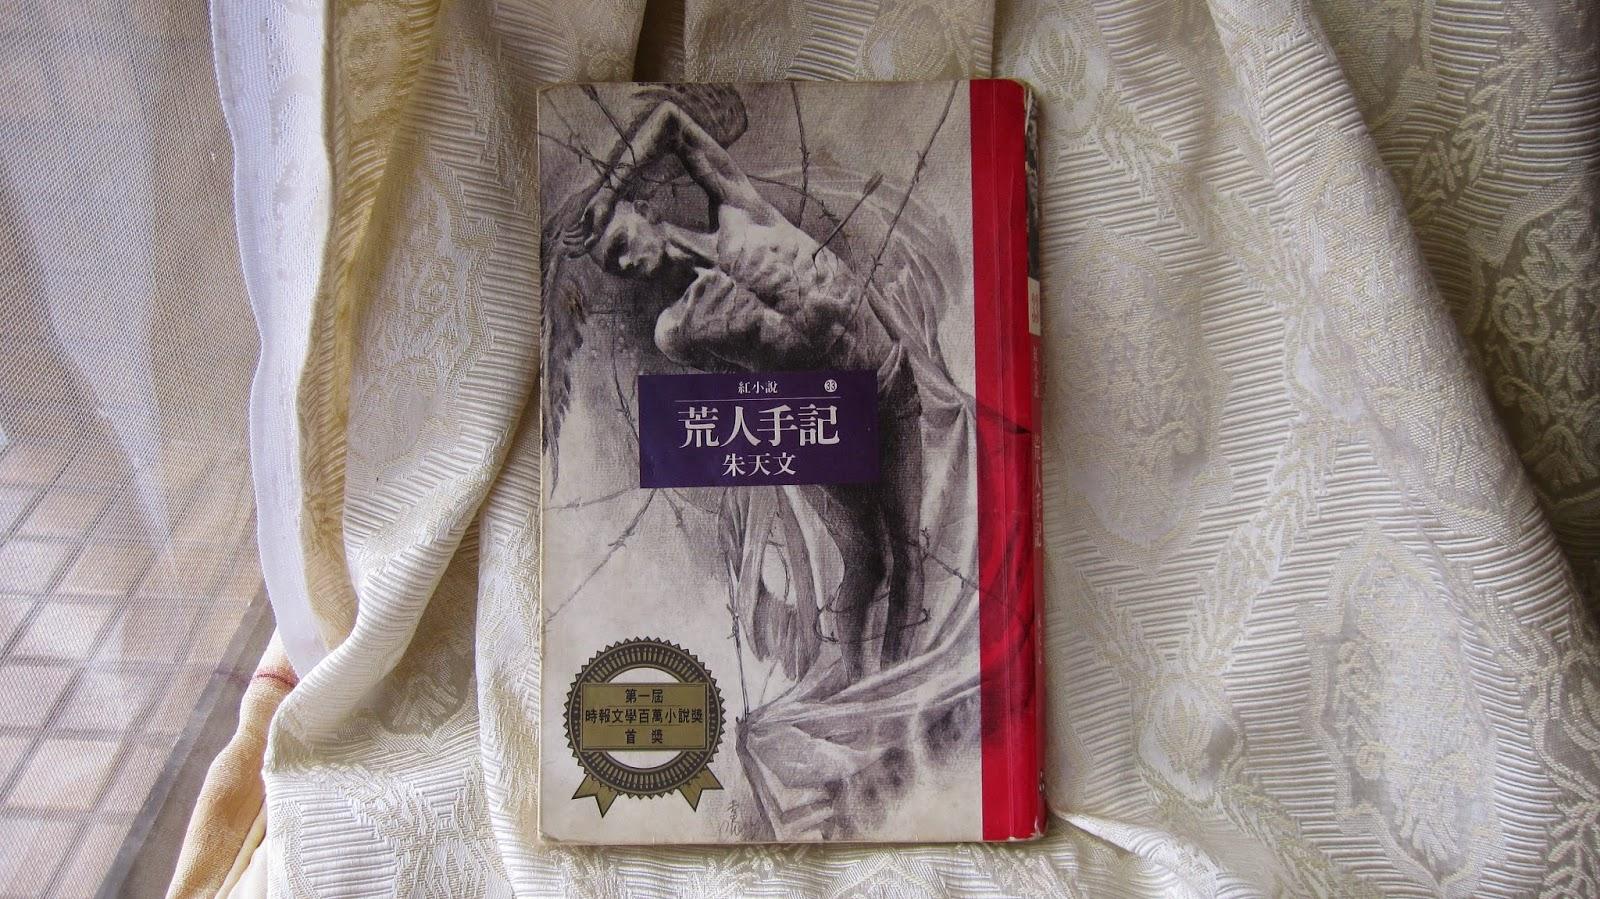 A-Mao的快樂泉源: 荒人手記—Notes of a Desolate Man